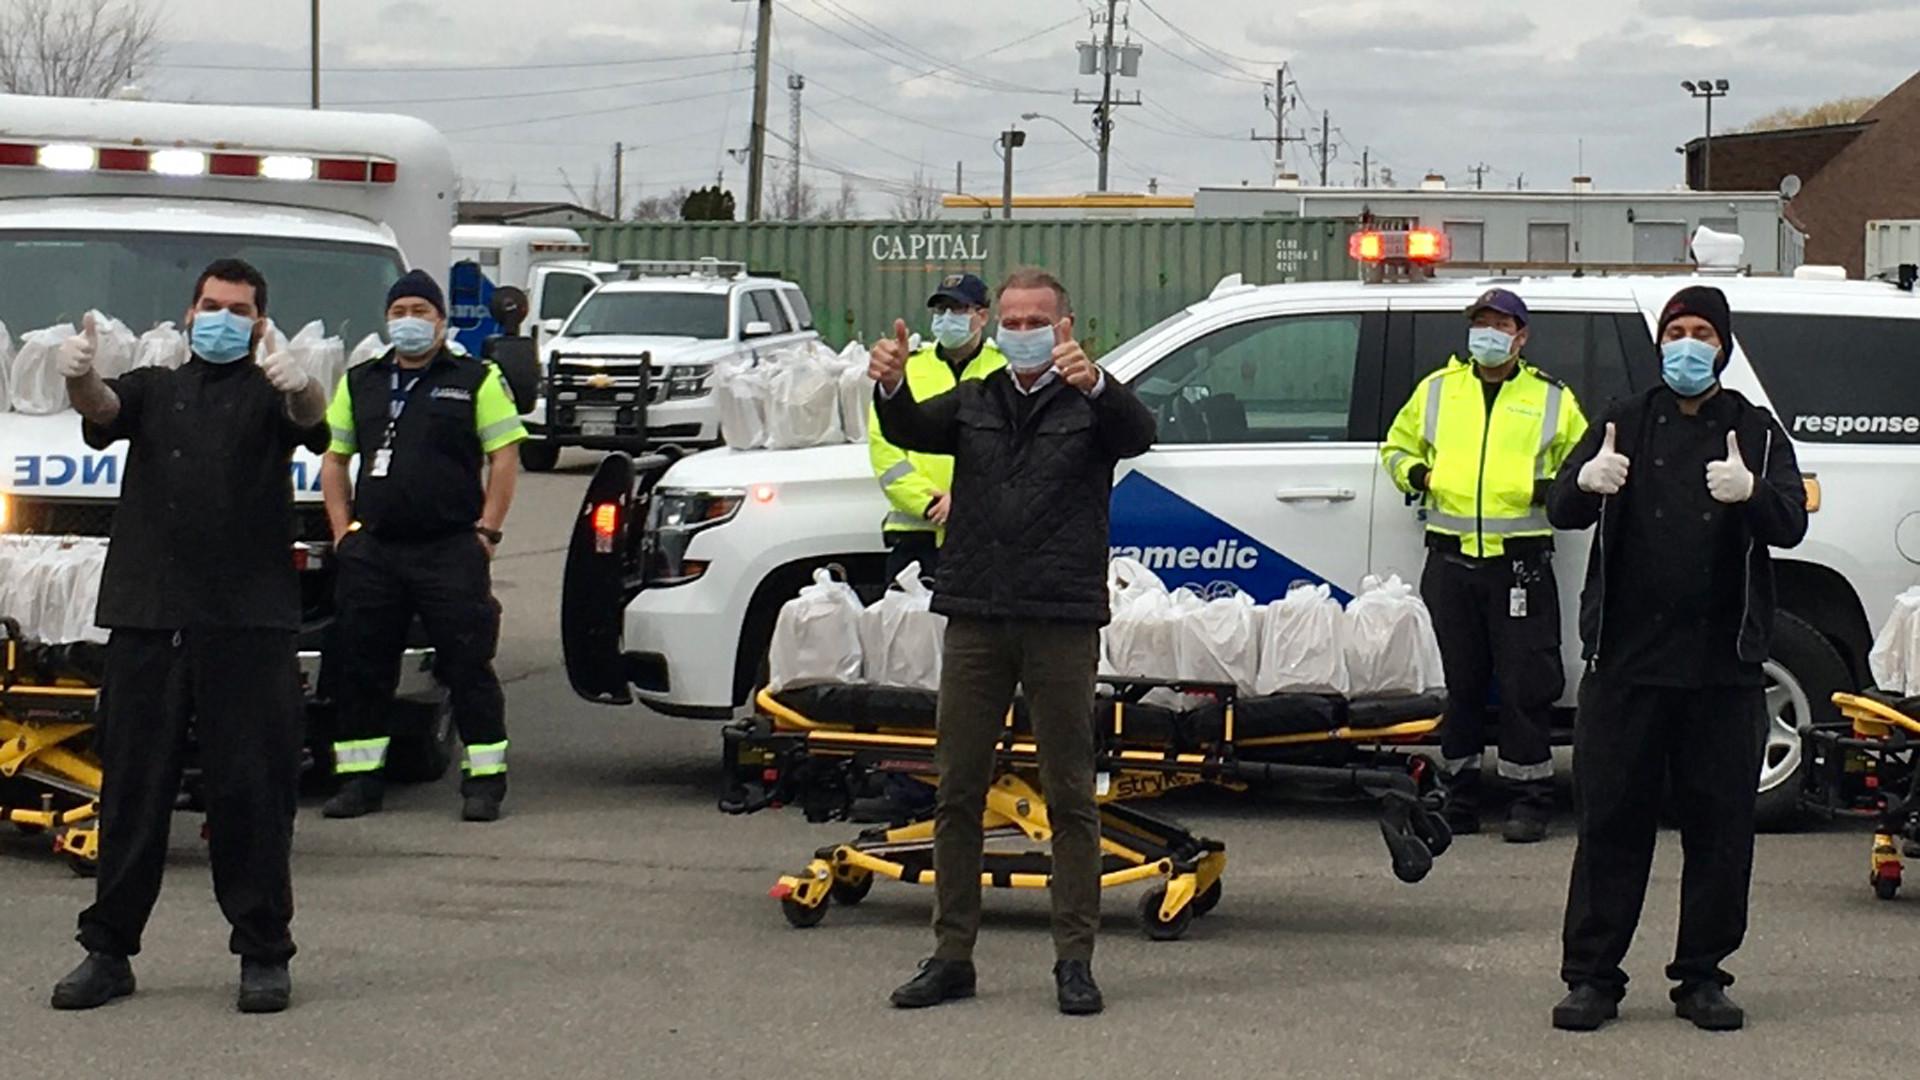 Mark McEwan delivers food to paramedics amid COVID-19 crisis